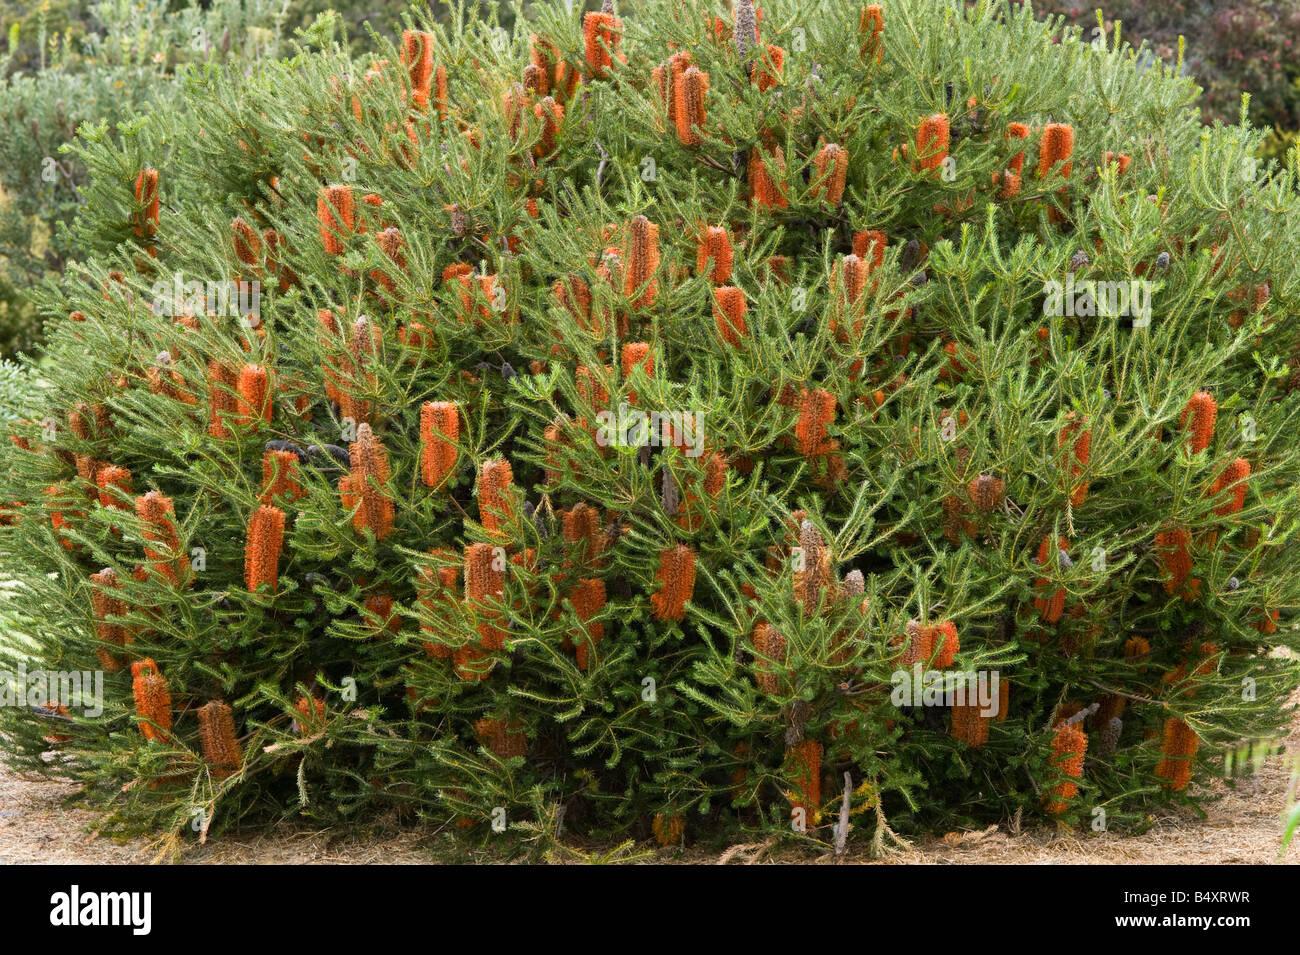 Heath Leaved Banksia Banksia Ericifolia Low Form In Flower Stock Photo Alamy